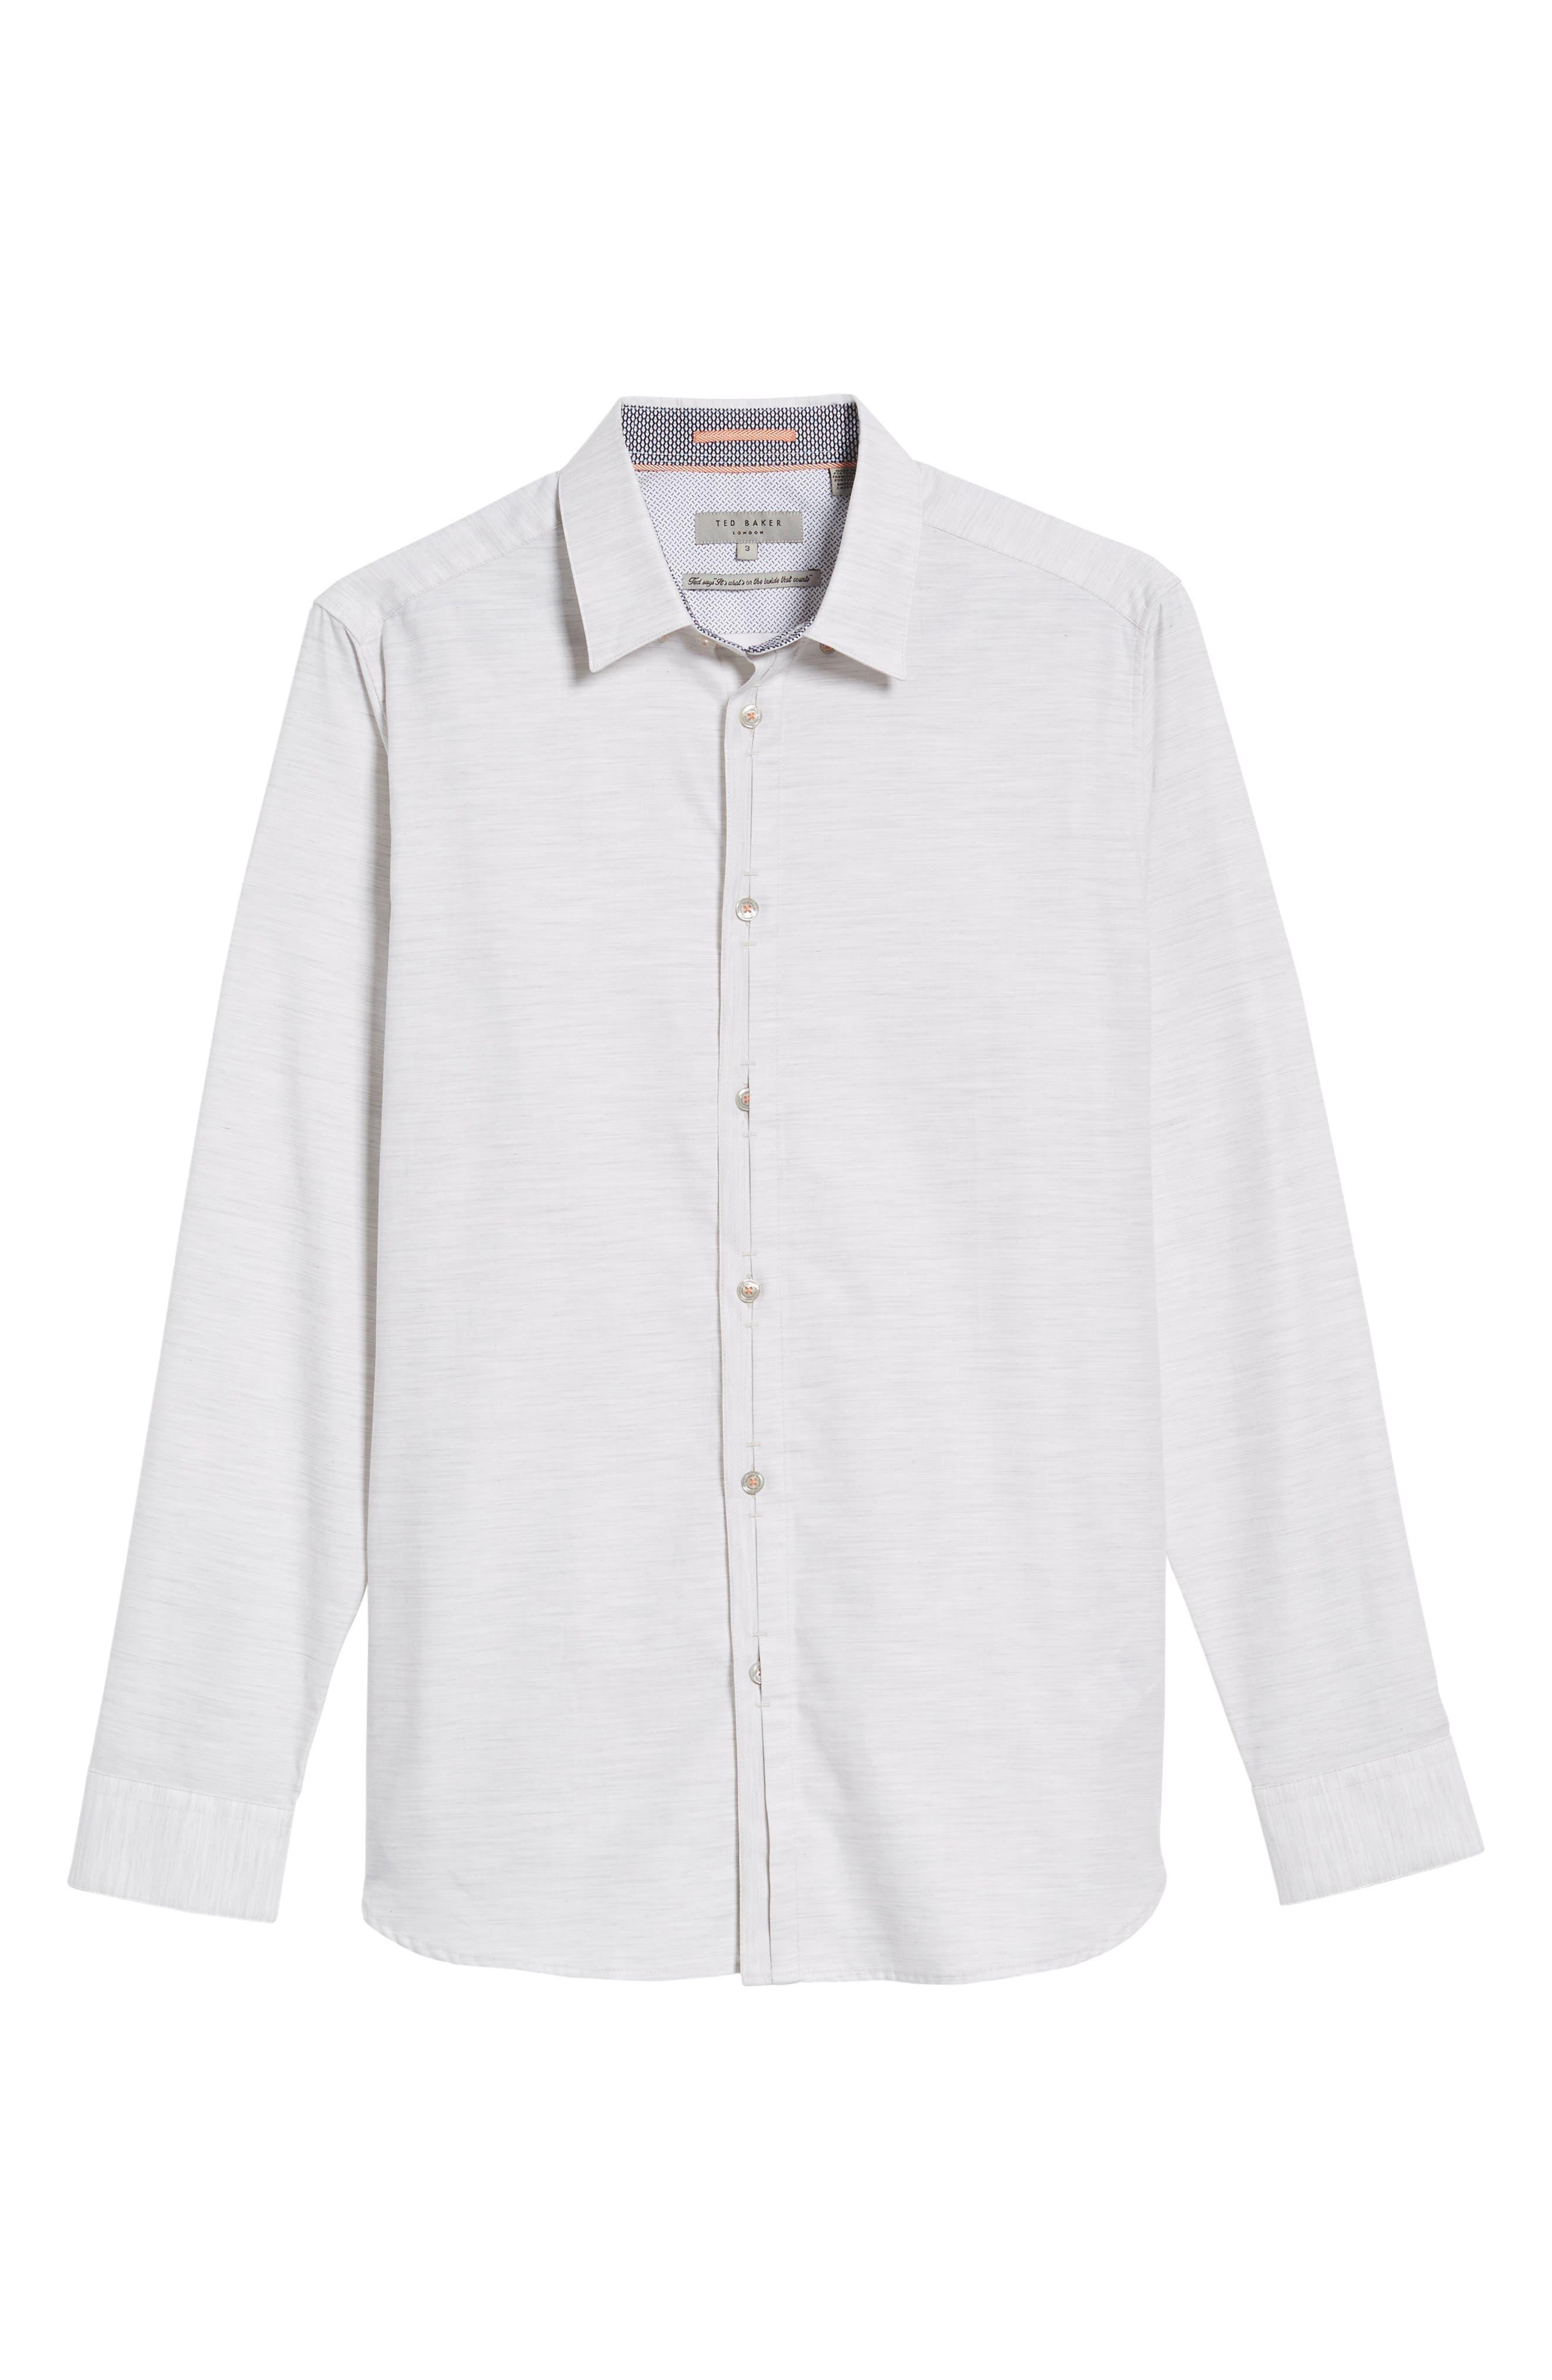 Annisley Modern Slim Fit Sport Shirt,                             Alternate thumbnail 6, color,                             031